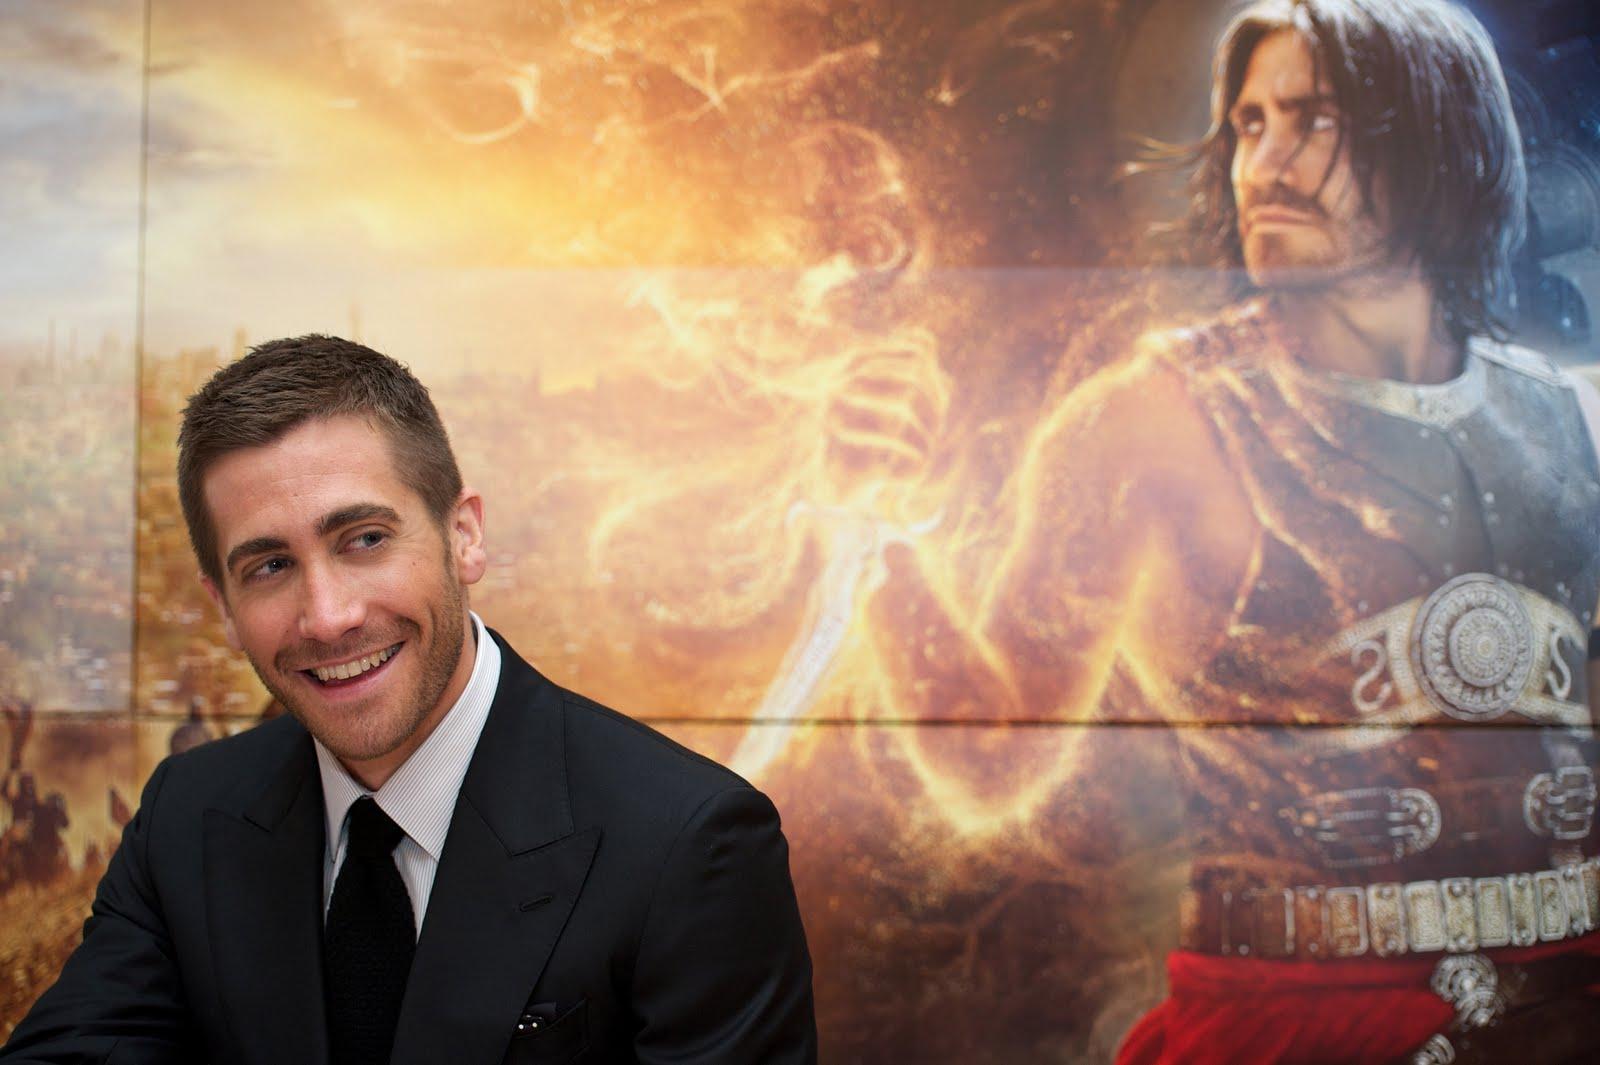 http://4.bp.blogspot.com/_R5WS6_kmmTI/TAUFkNmIUQI/AAAAAAAAvcA/_Rd3WqYfh68/s1600/73734_Jake_Gyllenhaal_prince_of_persia_013_122_41lo.jpg